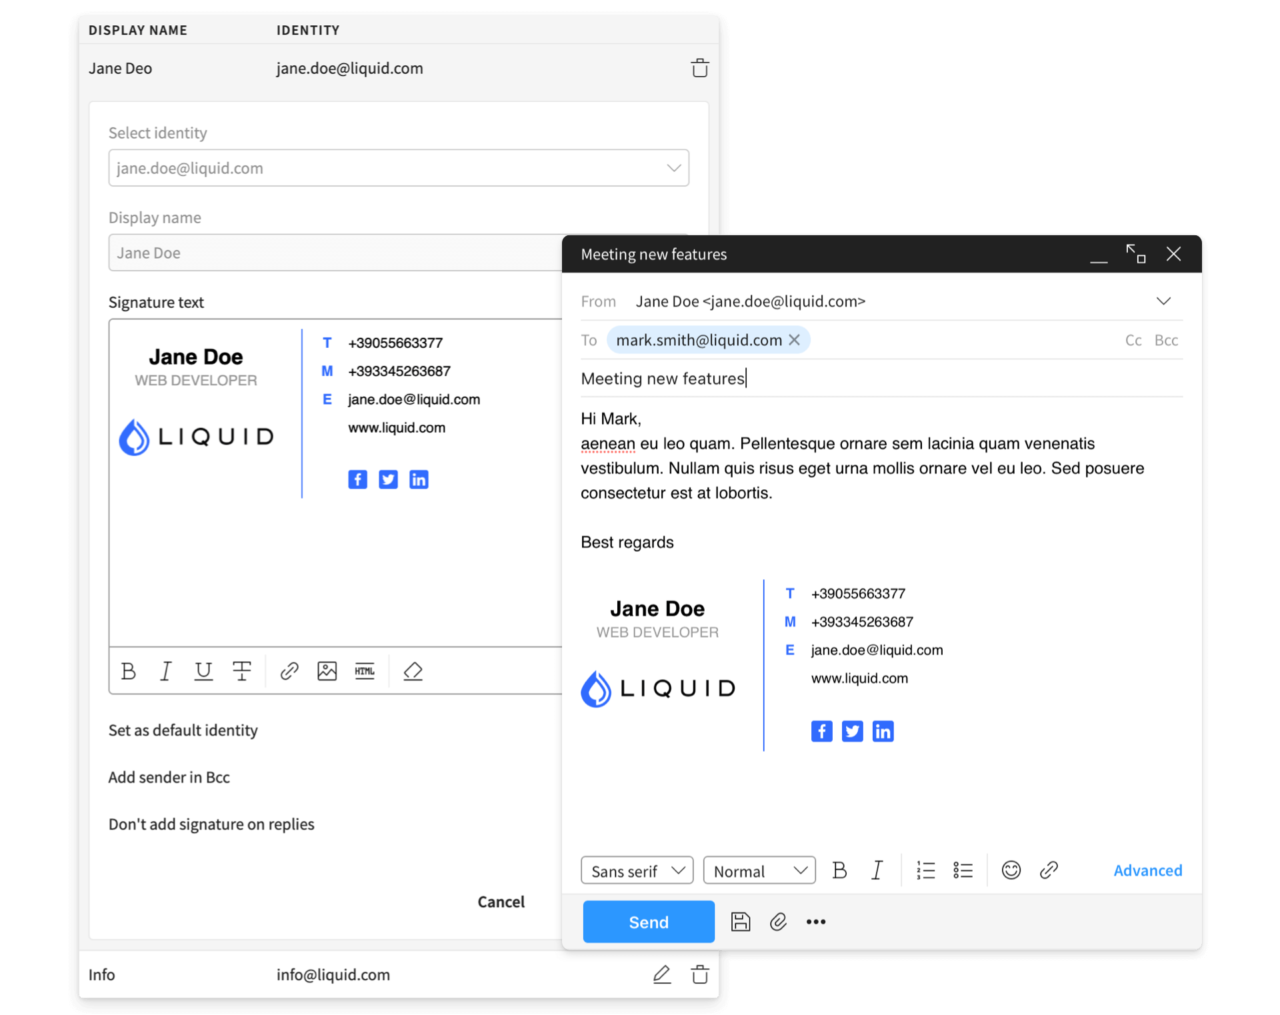 Firme email e gestione identità singoli utenti